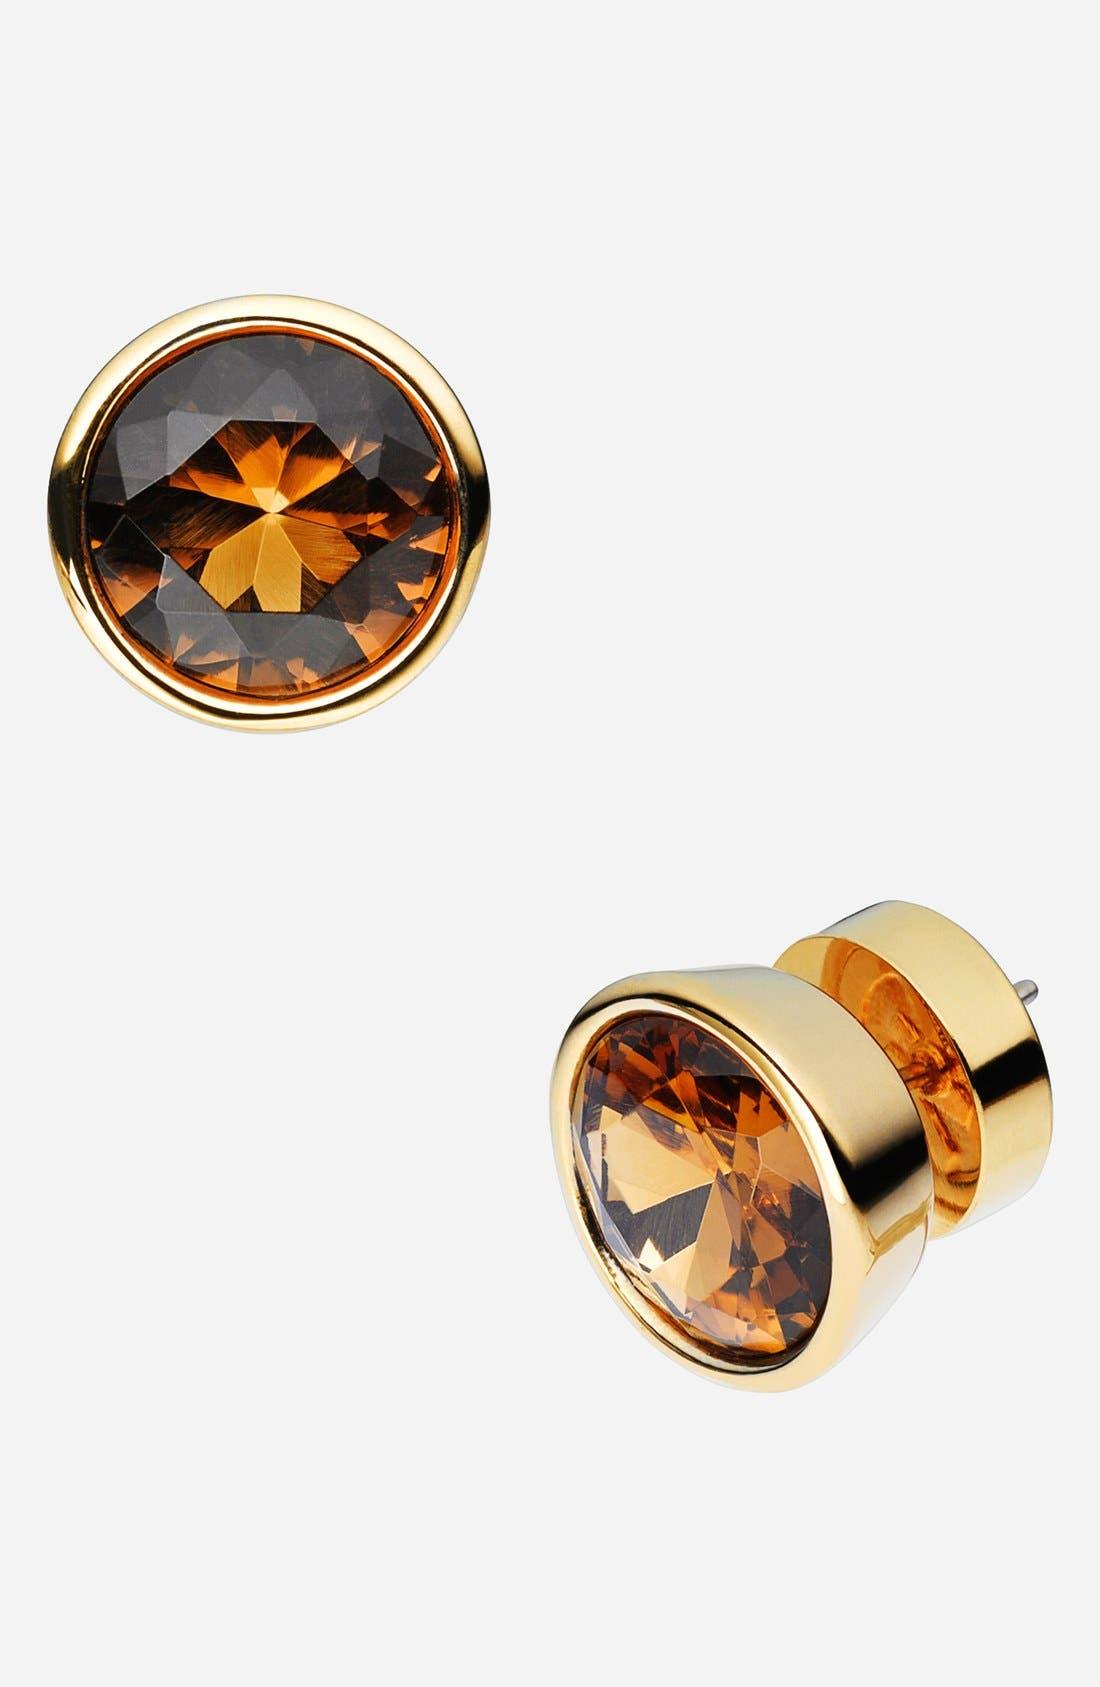 Alternate Image 1 Selected - Michael Kors 'Glam Classics' Cubic Zirconia Stud Earrings